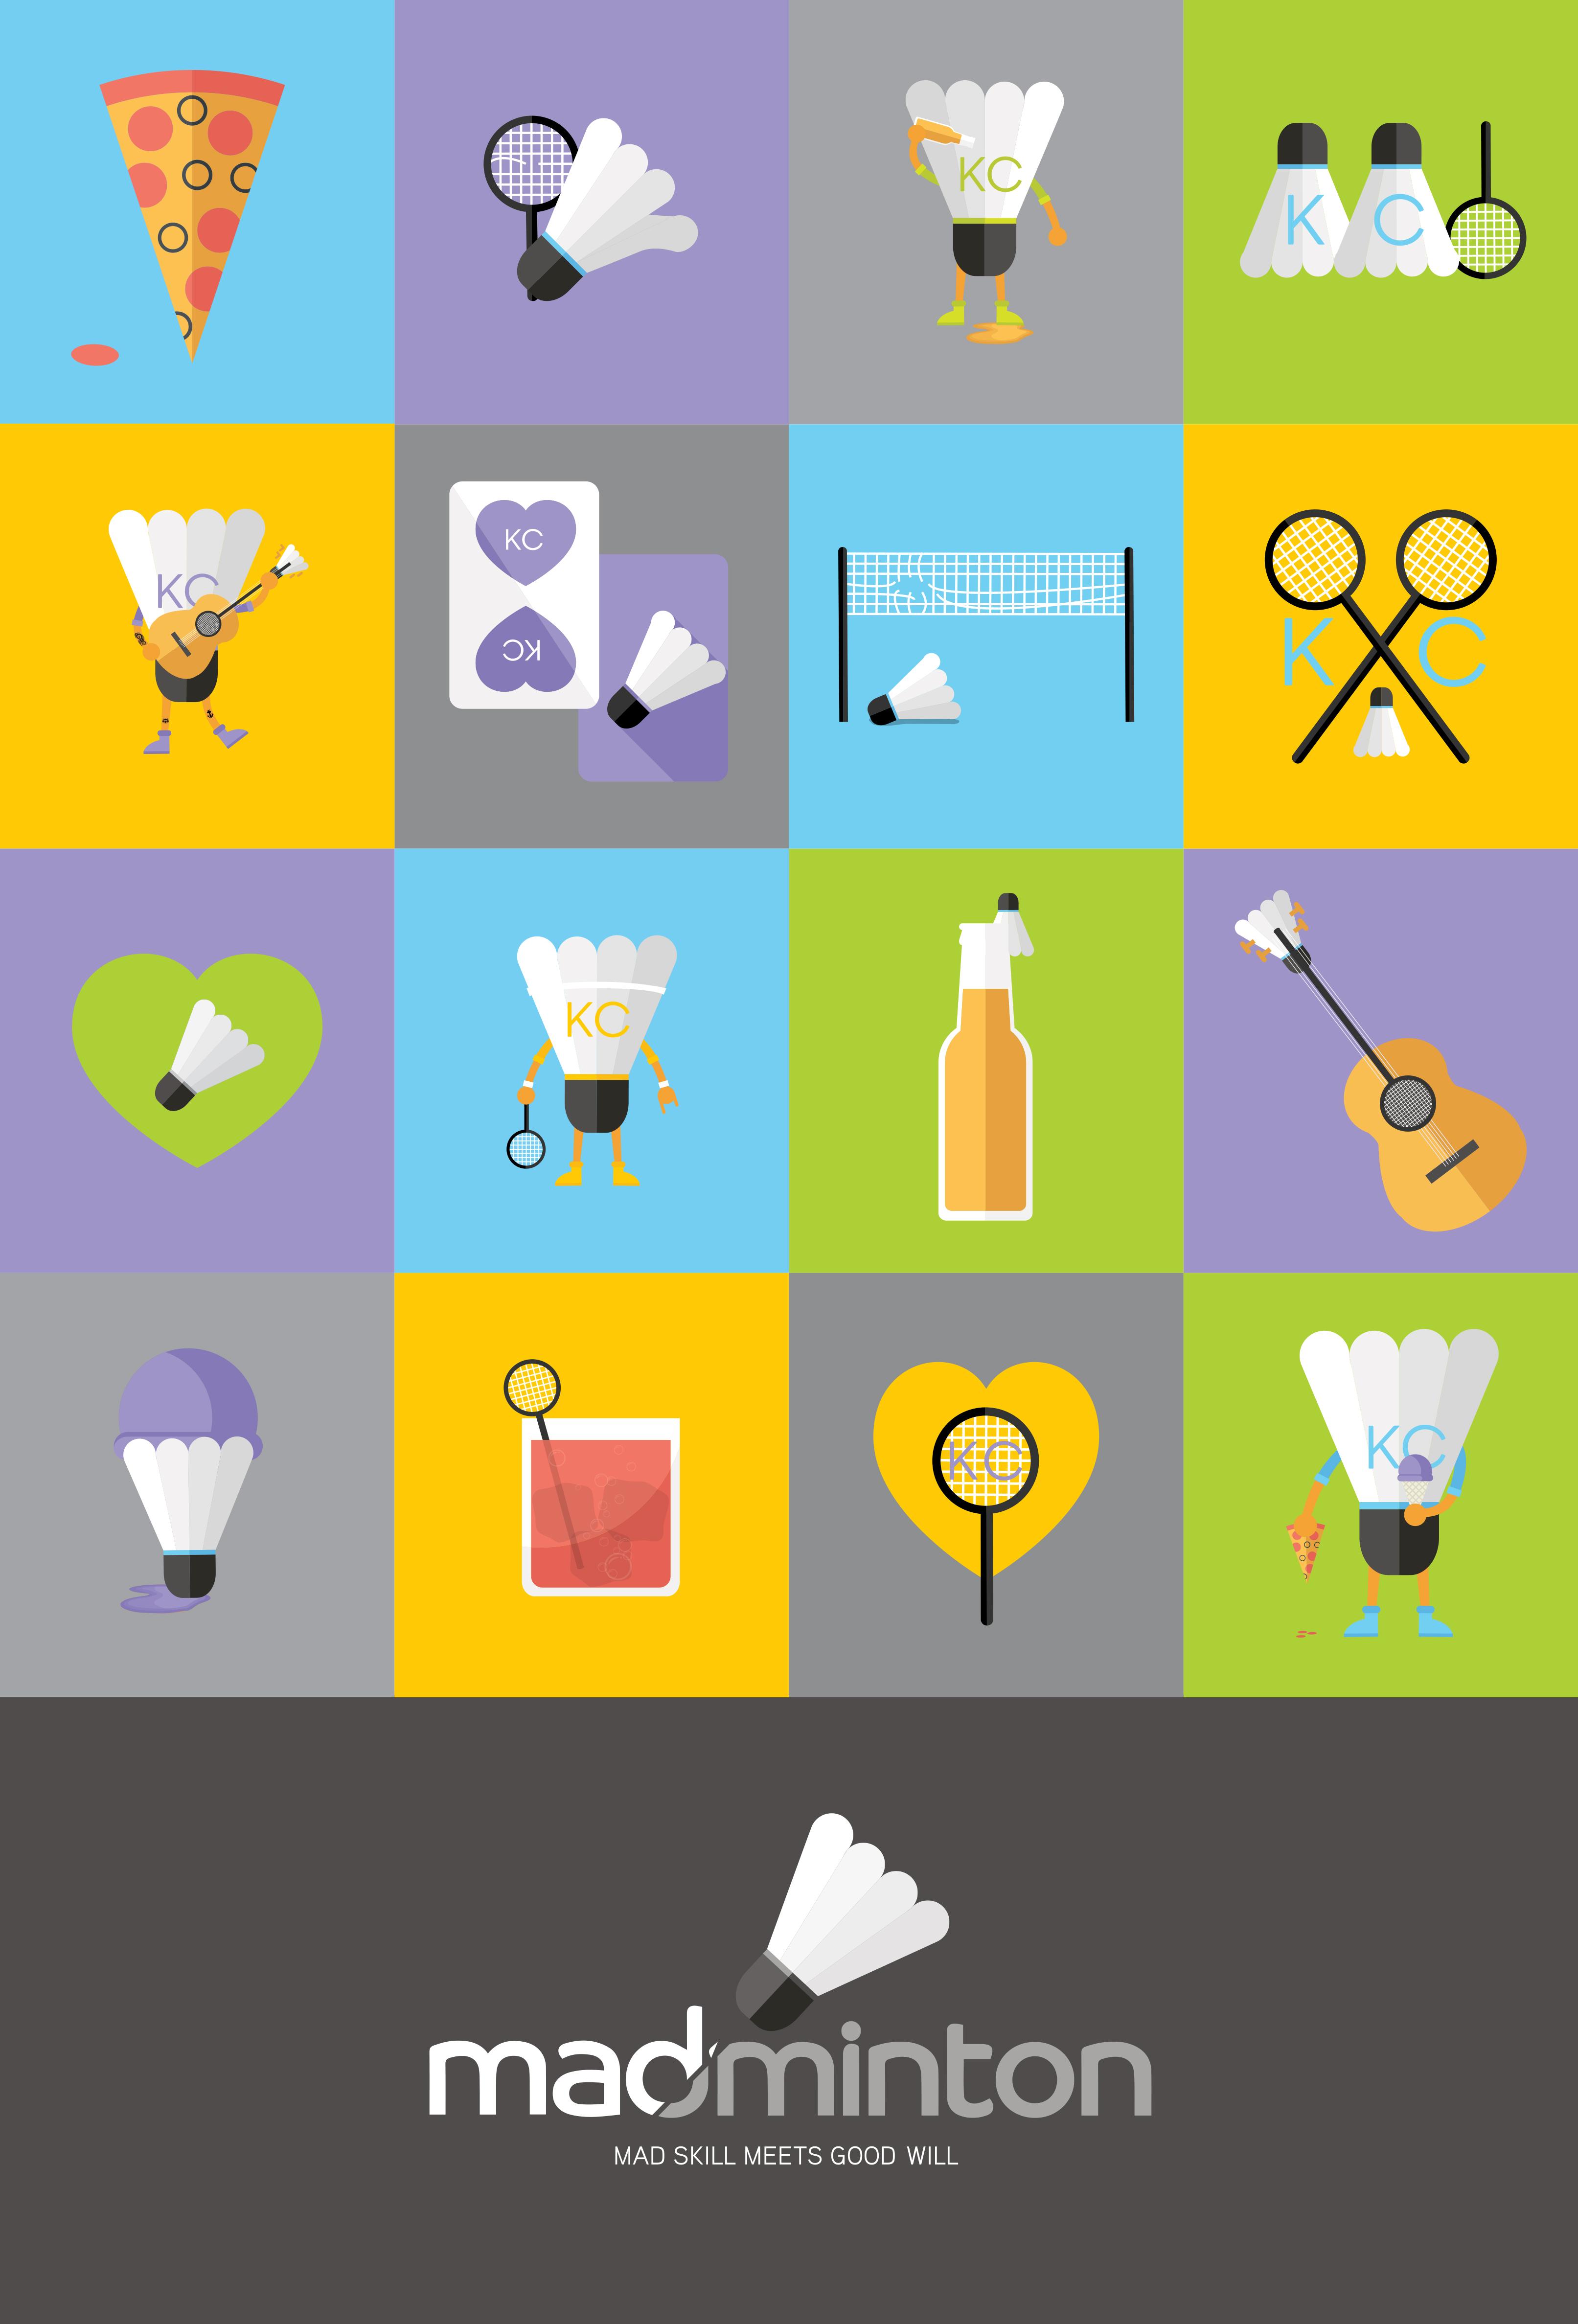 Madminton Brand Elements